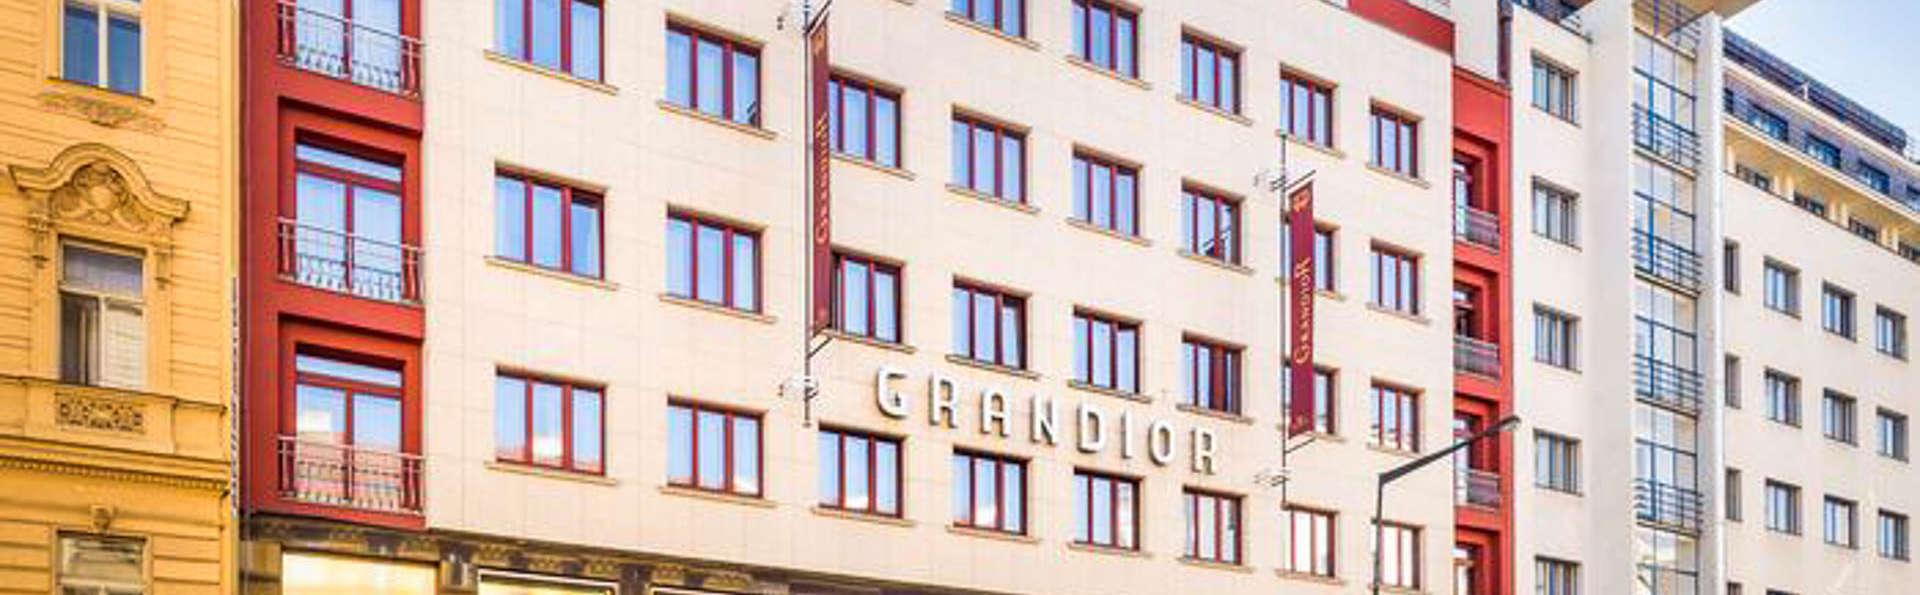 Grandior Hotel Prague - EDIT_FRONT2.jpg